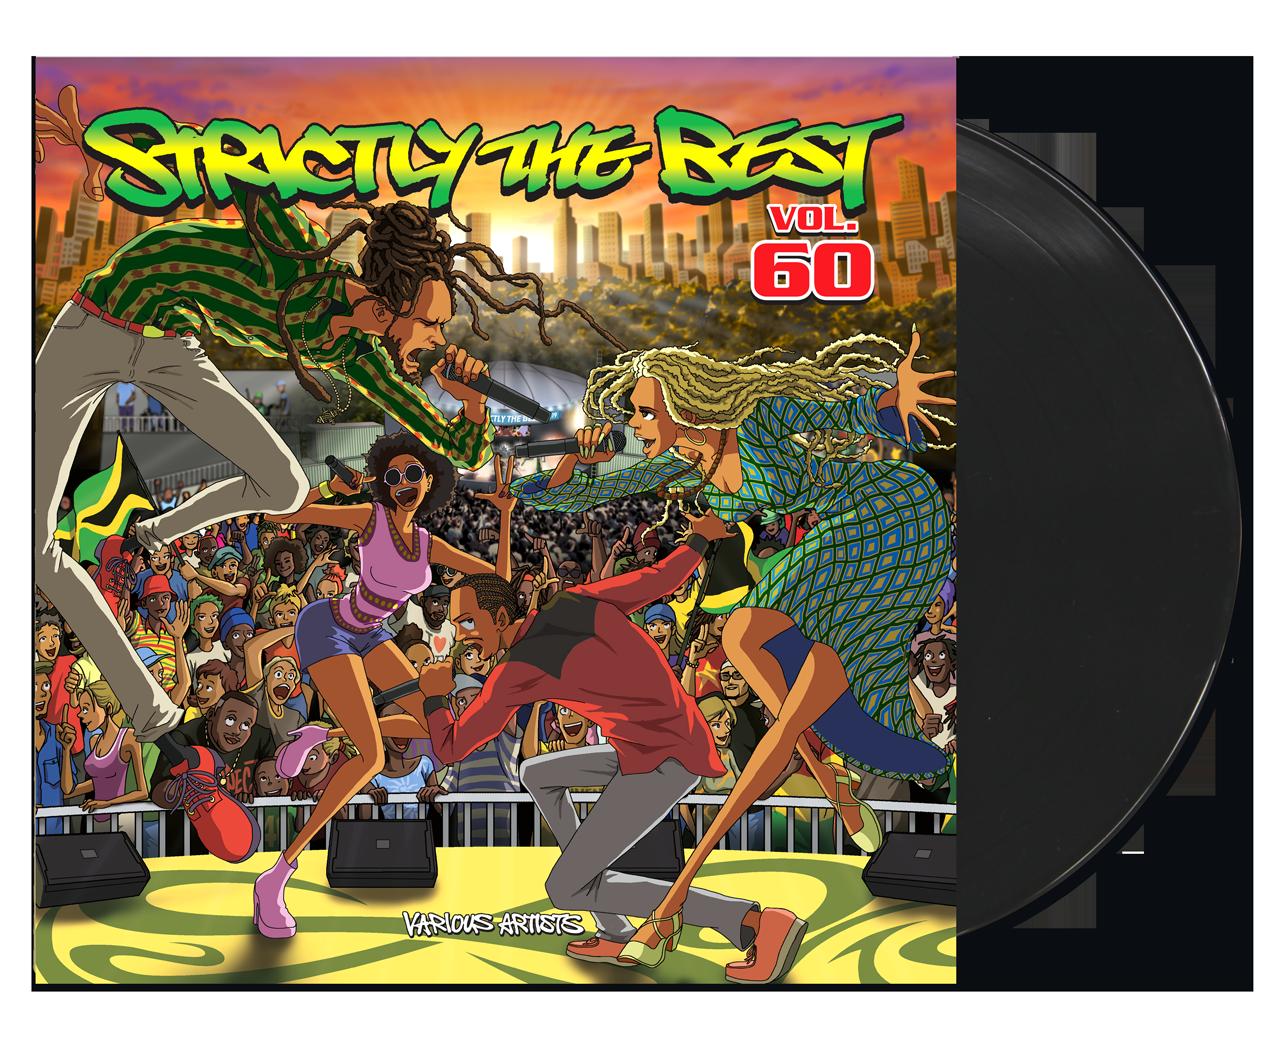 Strictly The Best vol. 60 (LP Vinyl)